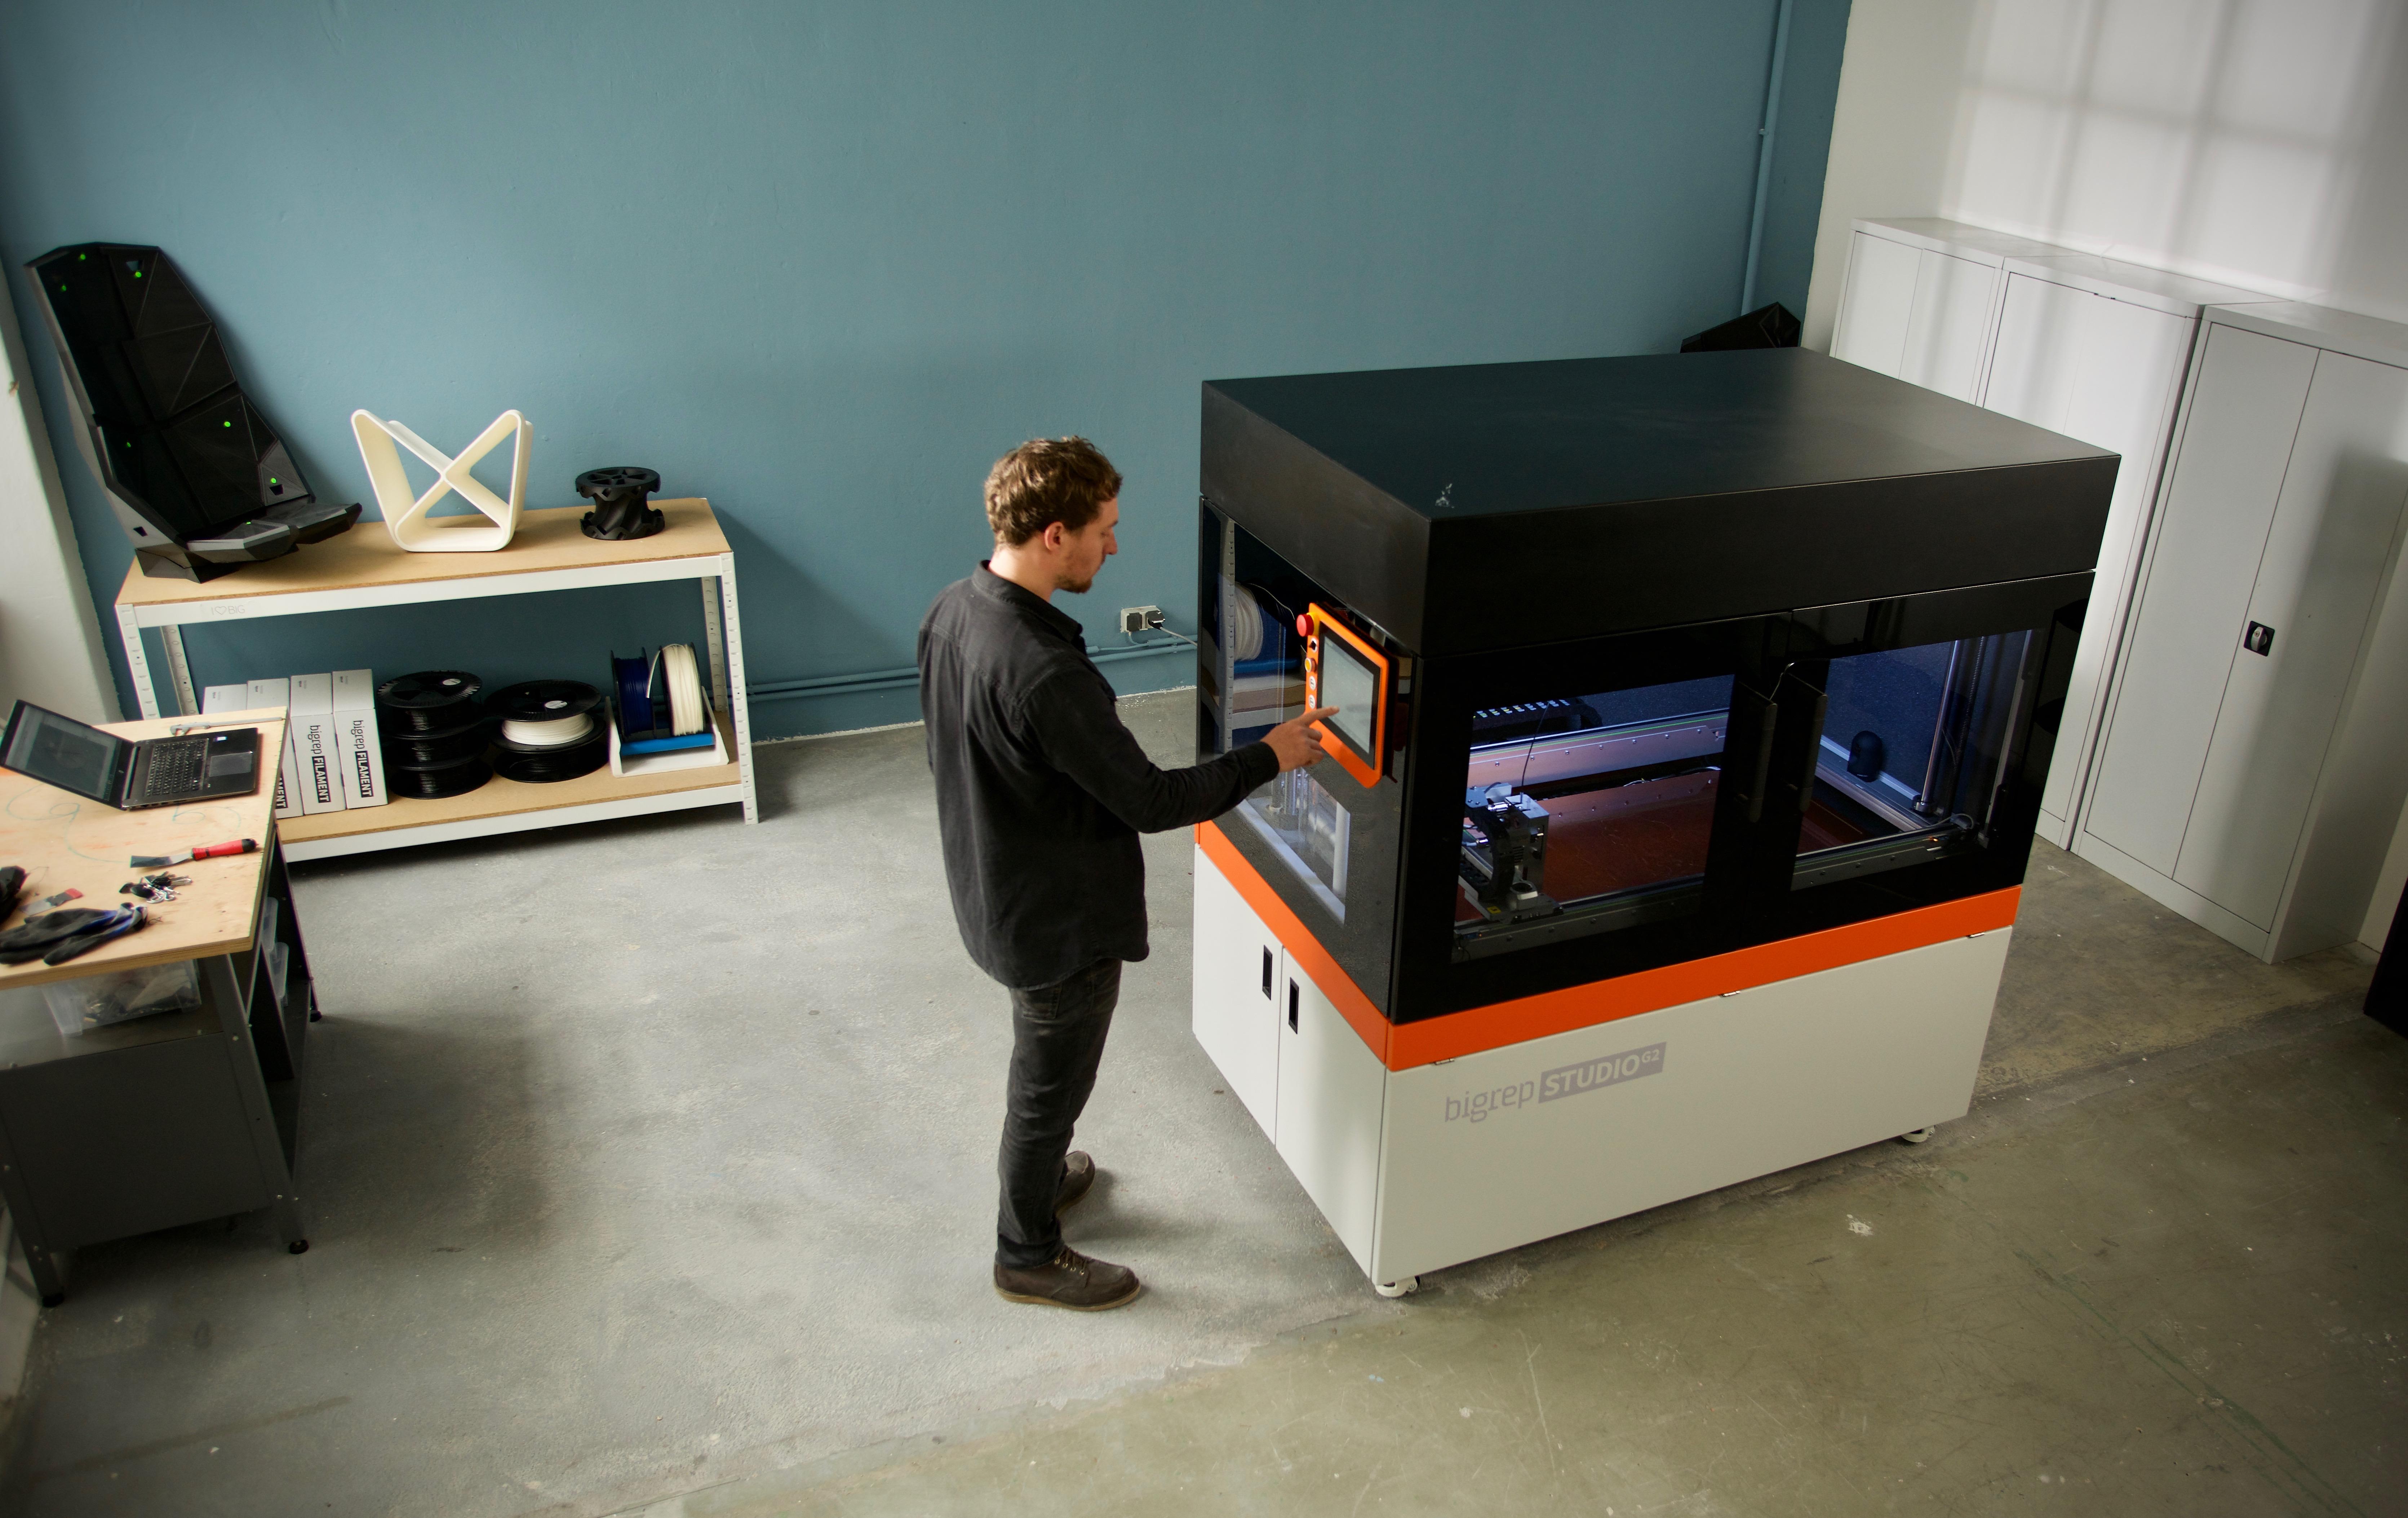 The BigRep STUDIO G2 3D printer. Photo via BigRep.